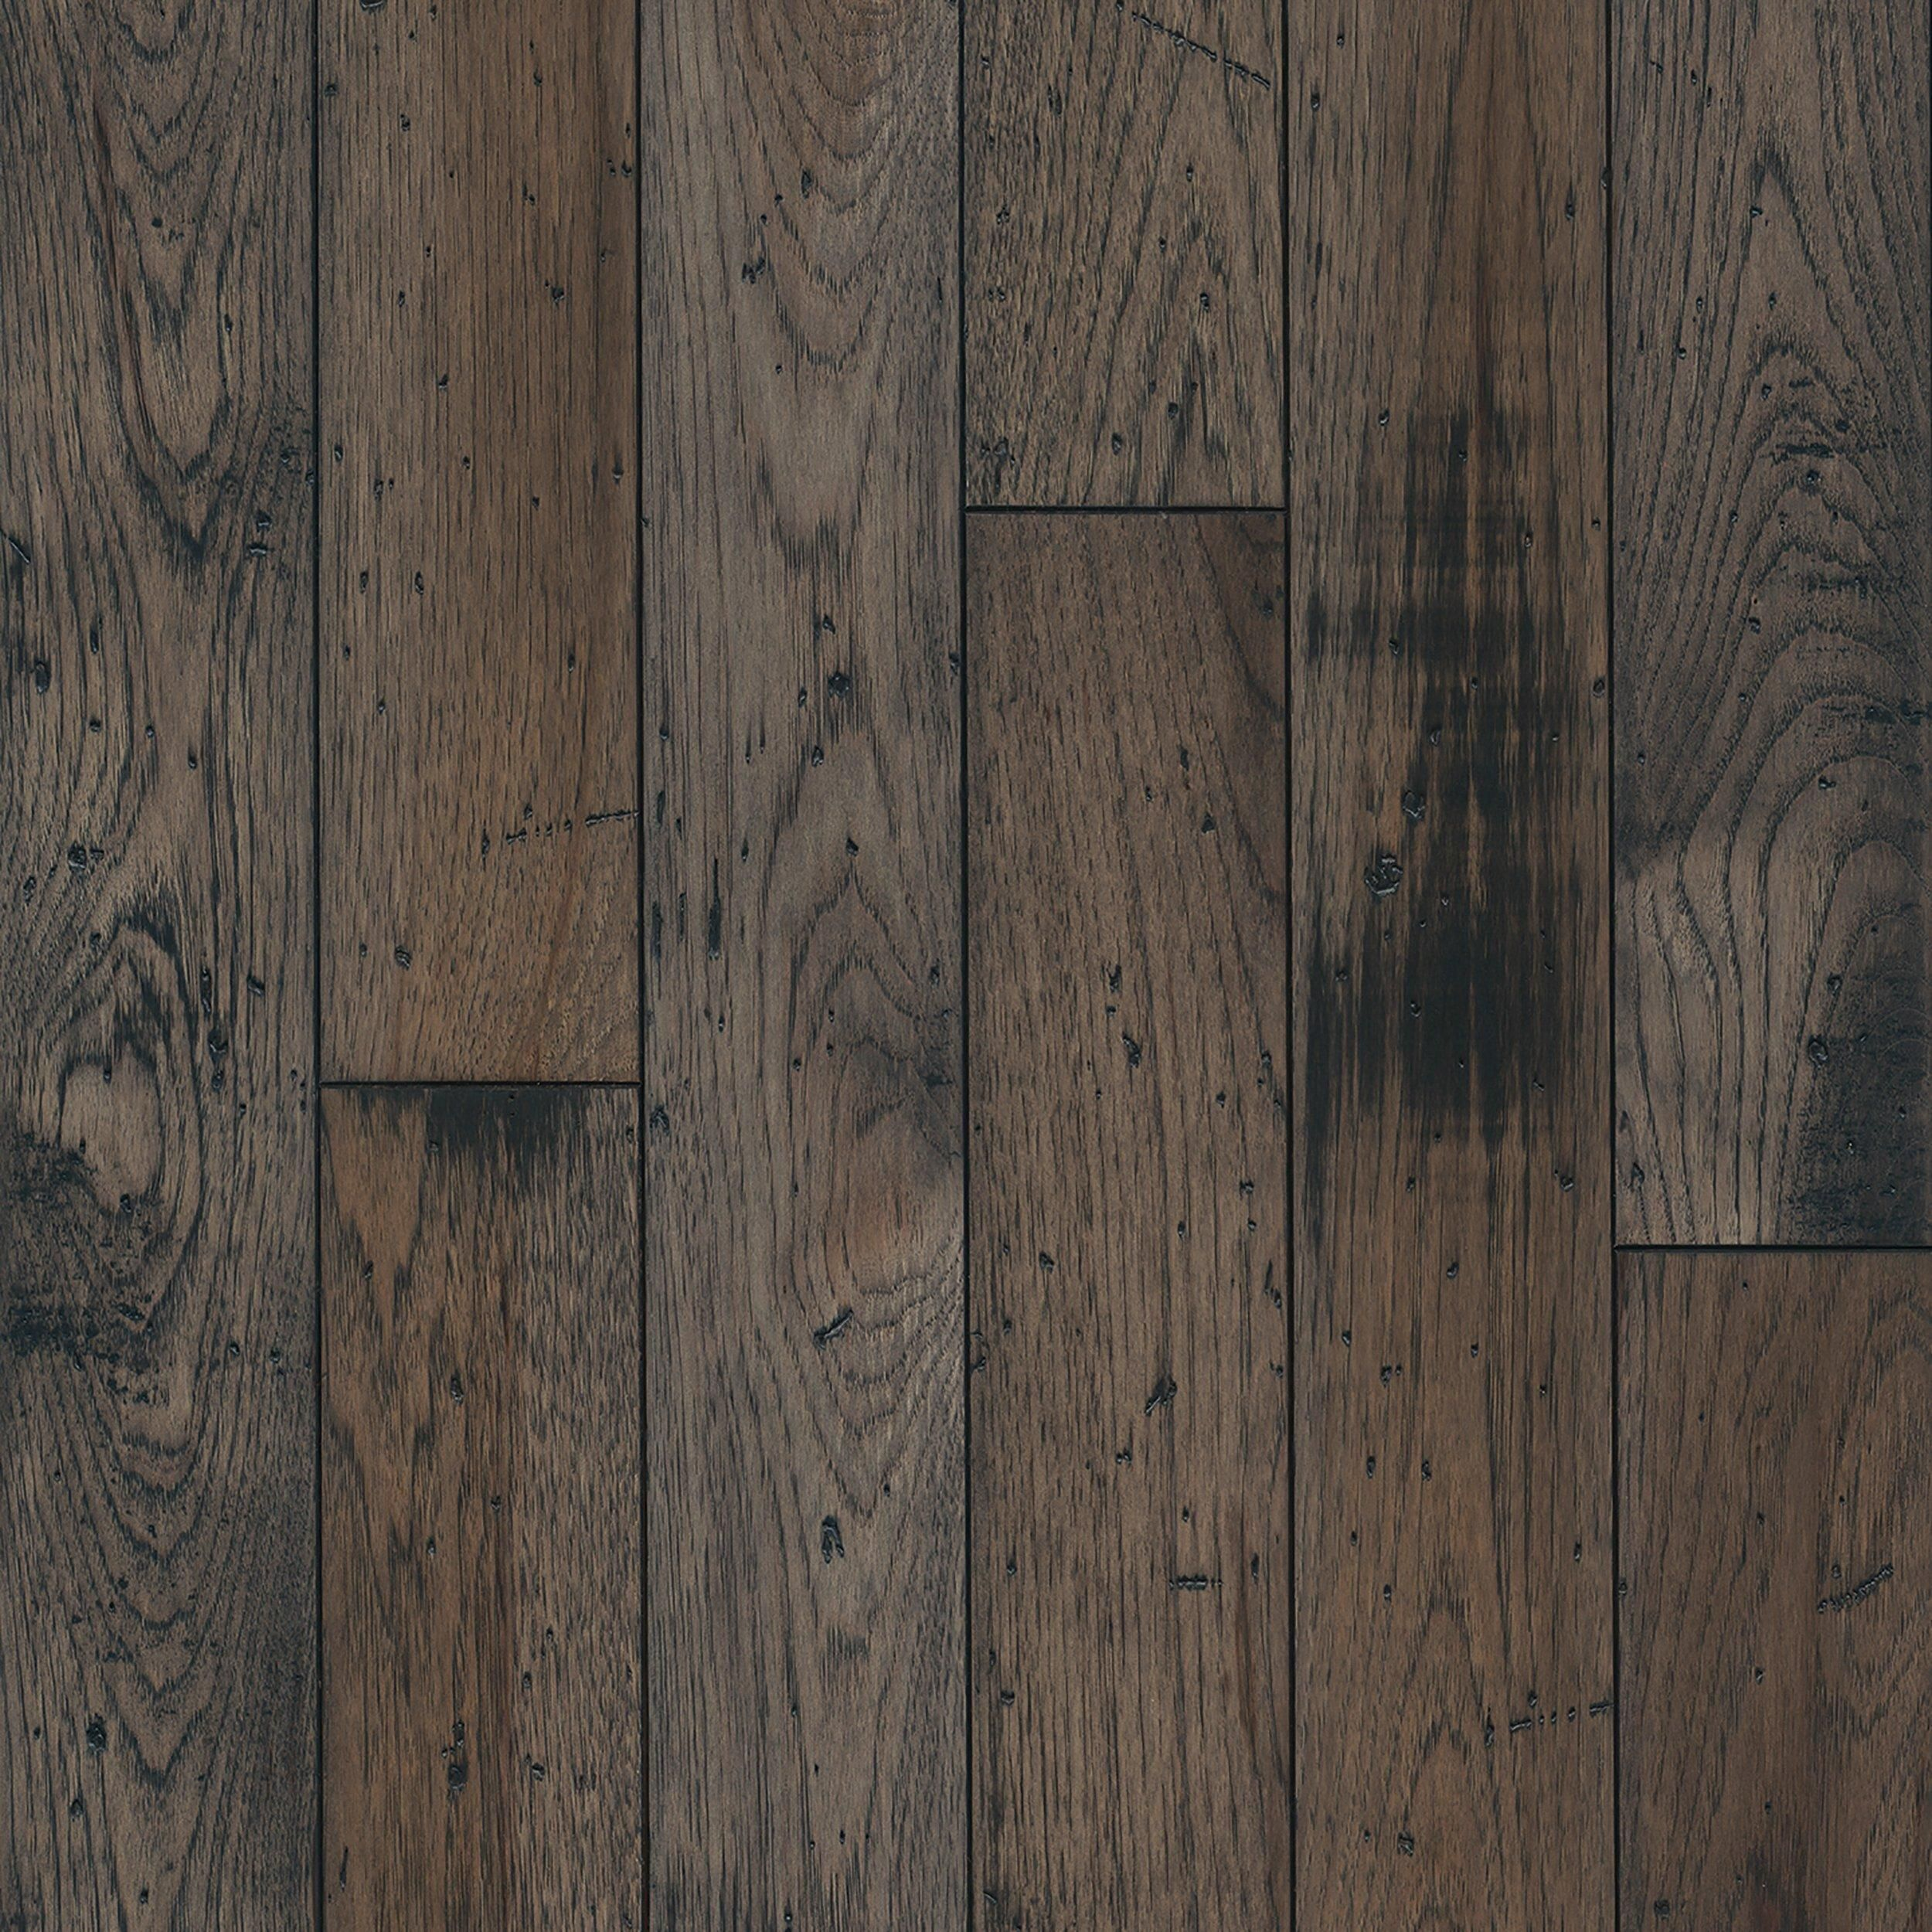 Greyhound Hickory Distressed Solid Hardwood Hickory Wood Floors Rustic Wood Floors Distressed Wood Floors